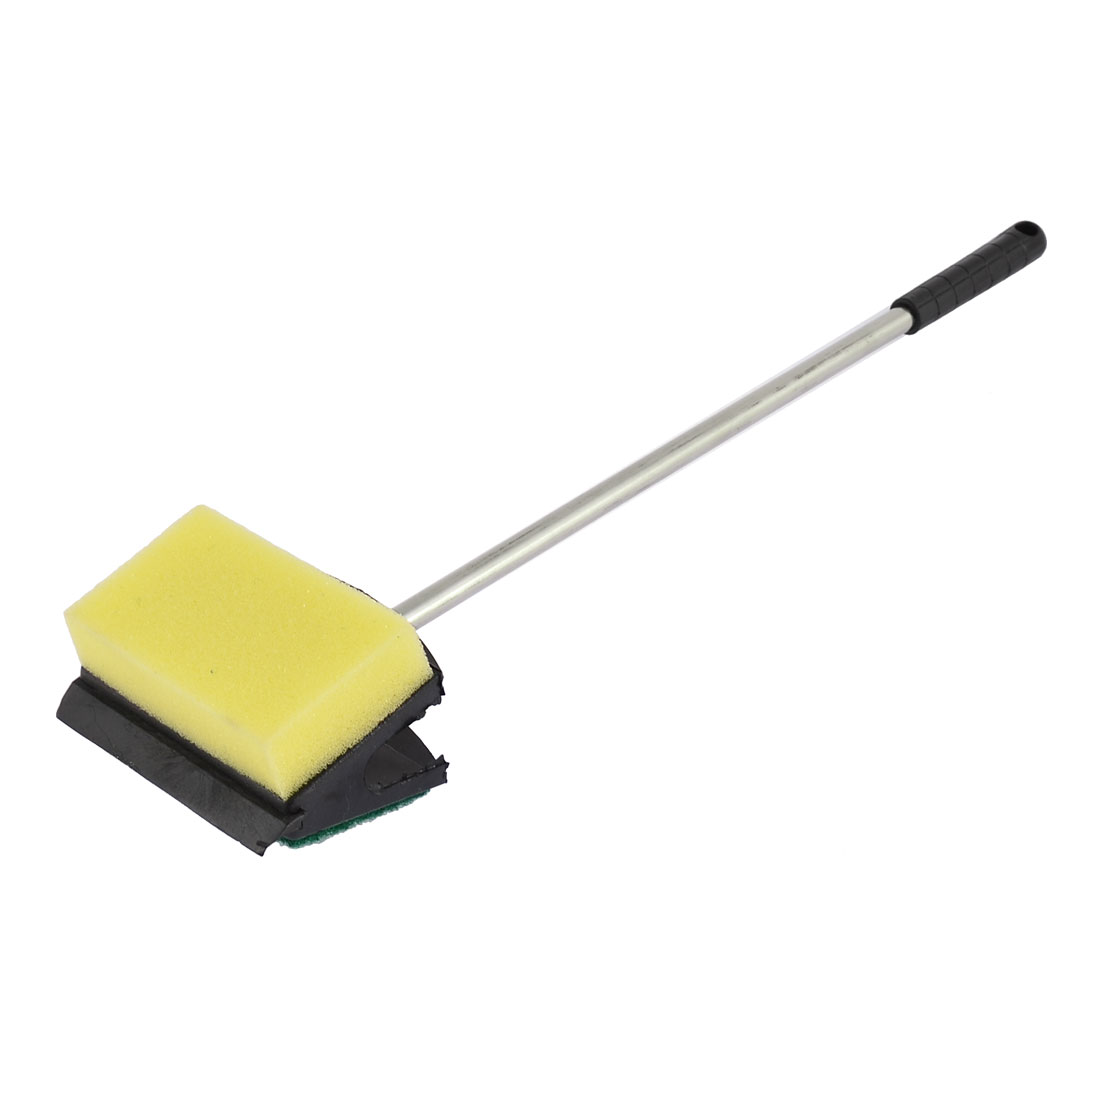 Metal Handle Dual Sides Sponge Cleaning Brush for Aquarium Fish Tank